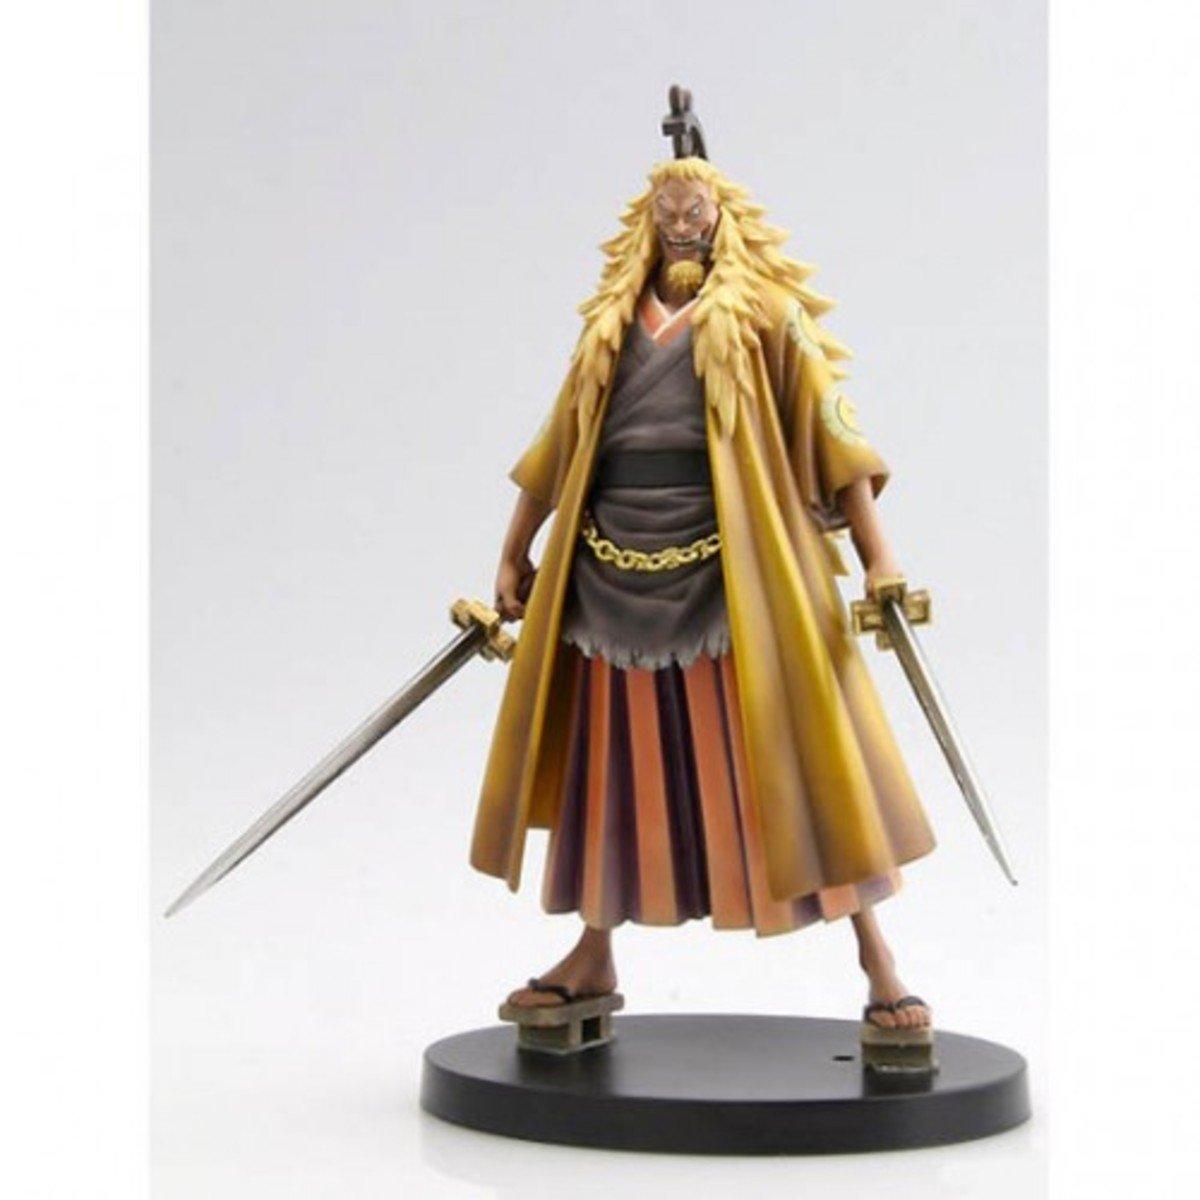 One Piece  海賊王 DX 景品 偉大航路的男人 vol 2 金獅子 史基